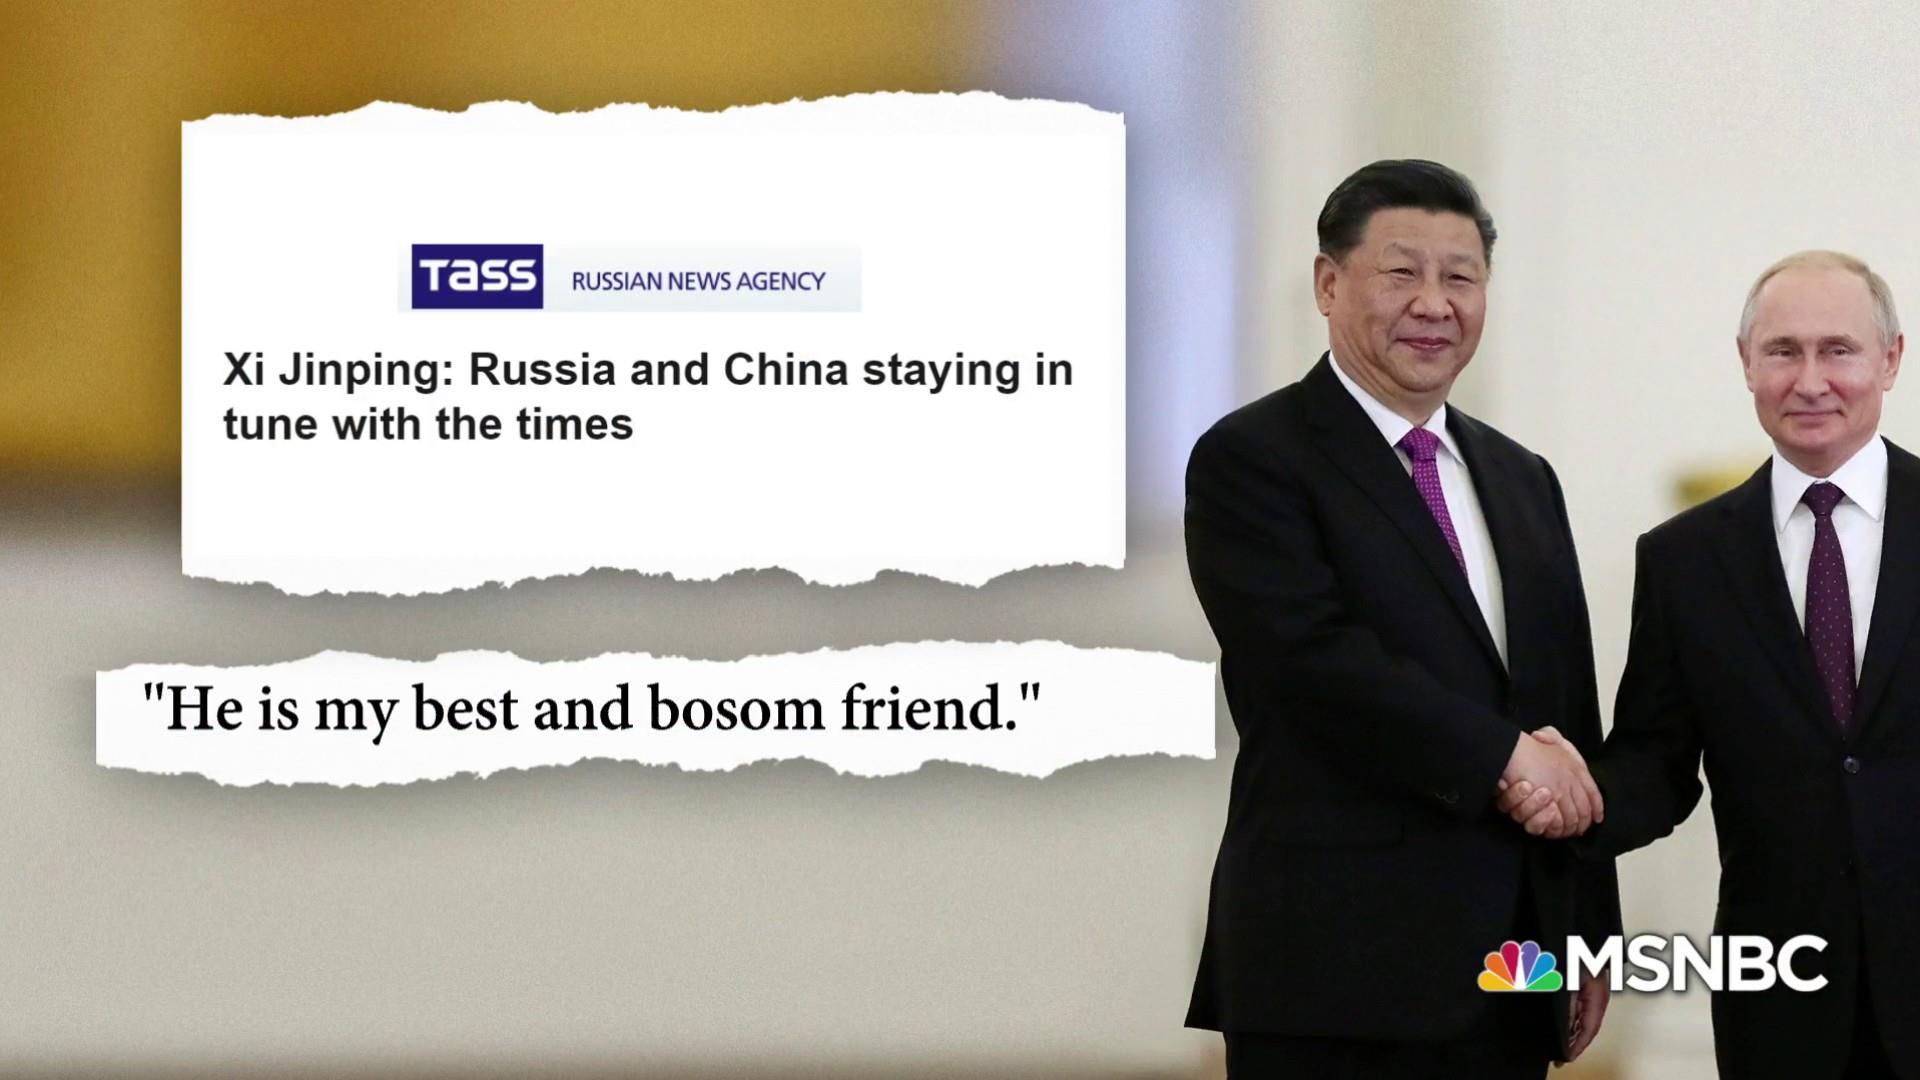 Chinese President Xi Jinping calls Russian Pres. Putin best friend